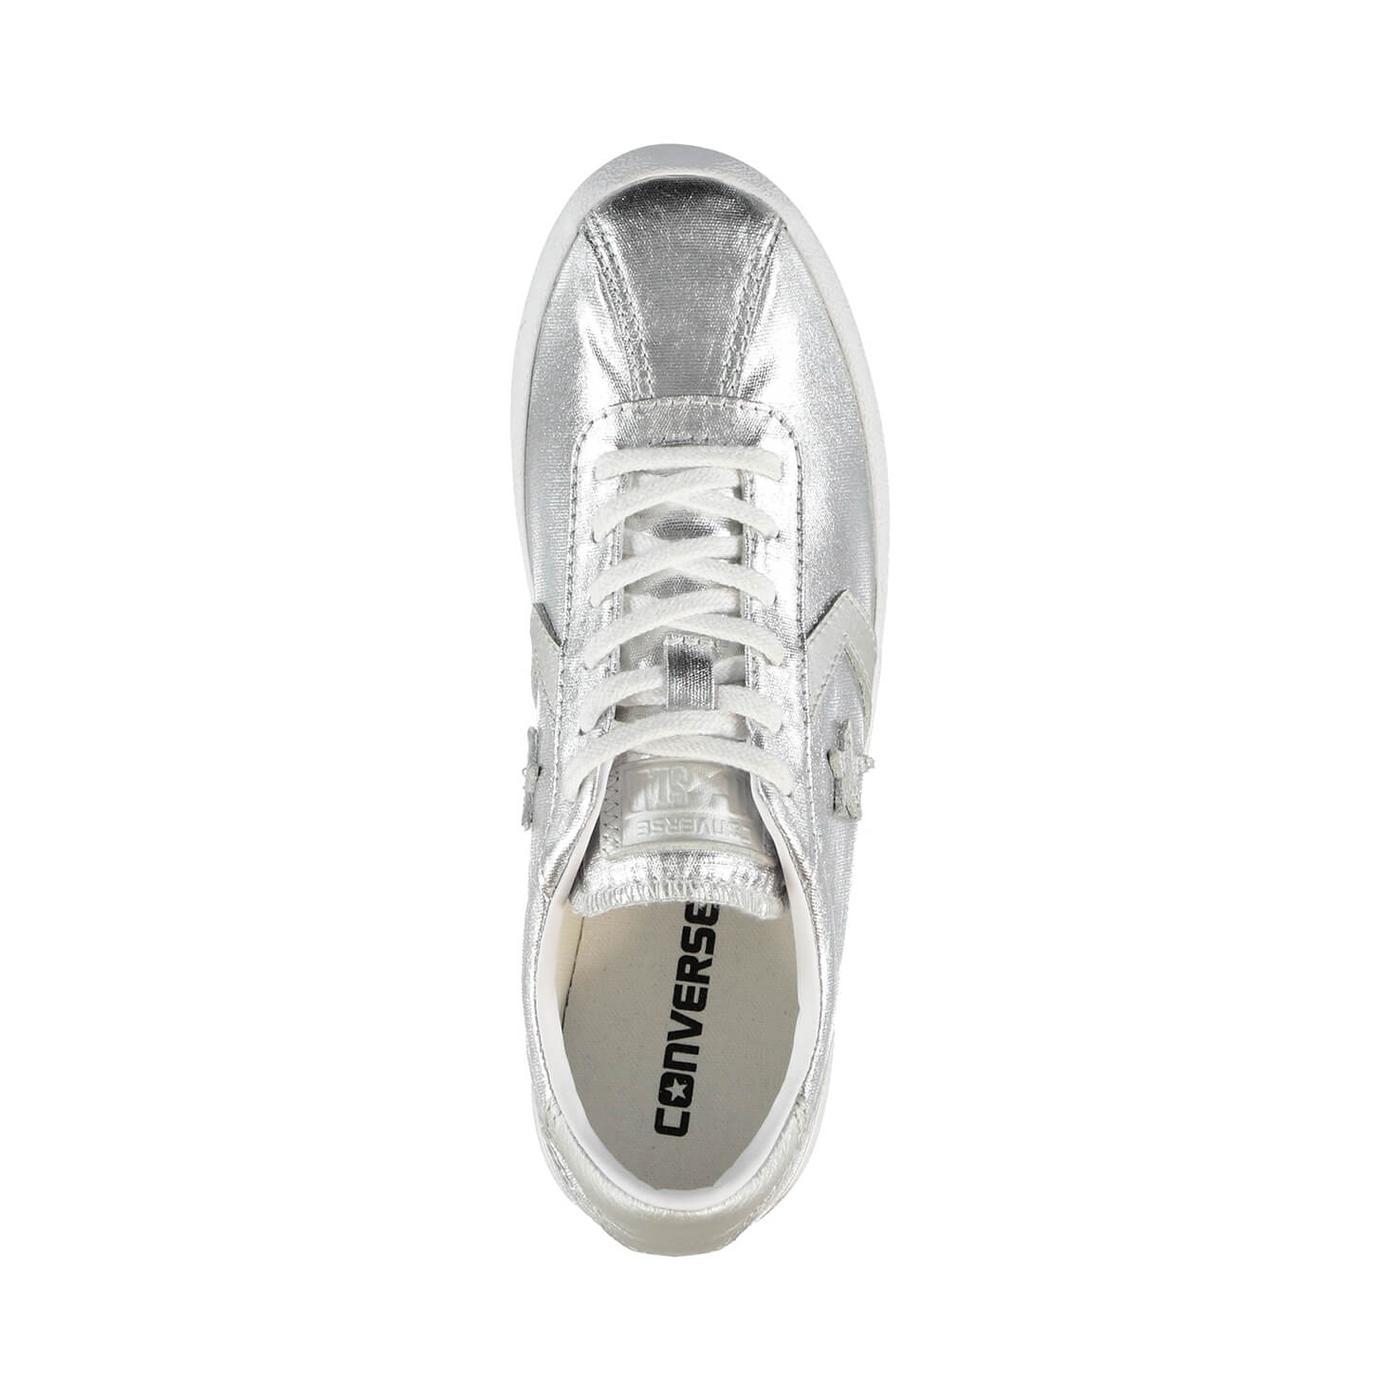 Converse Breakpoint Kadın Gümüş Sneaker